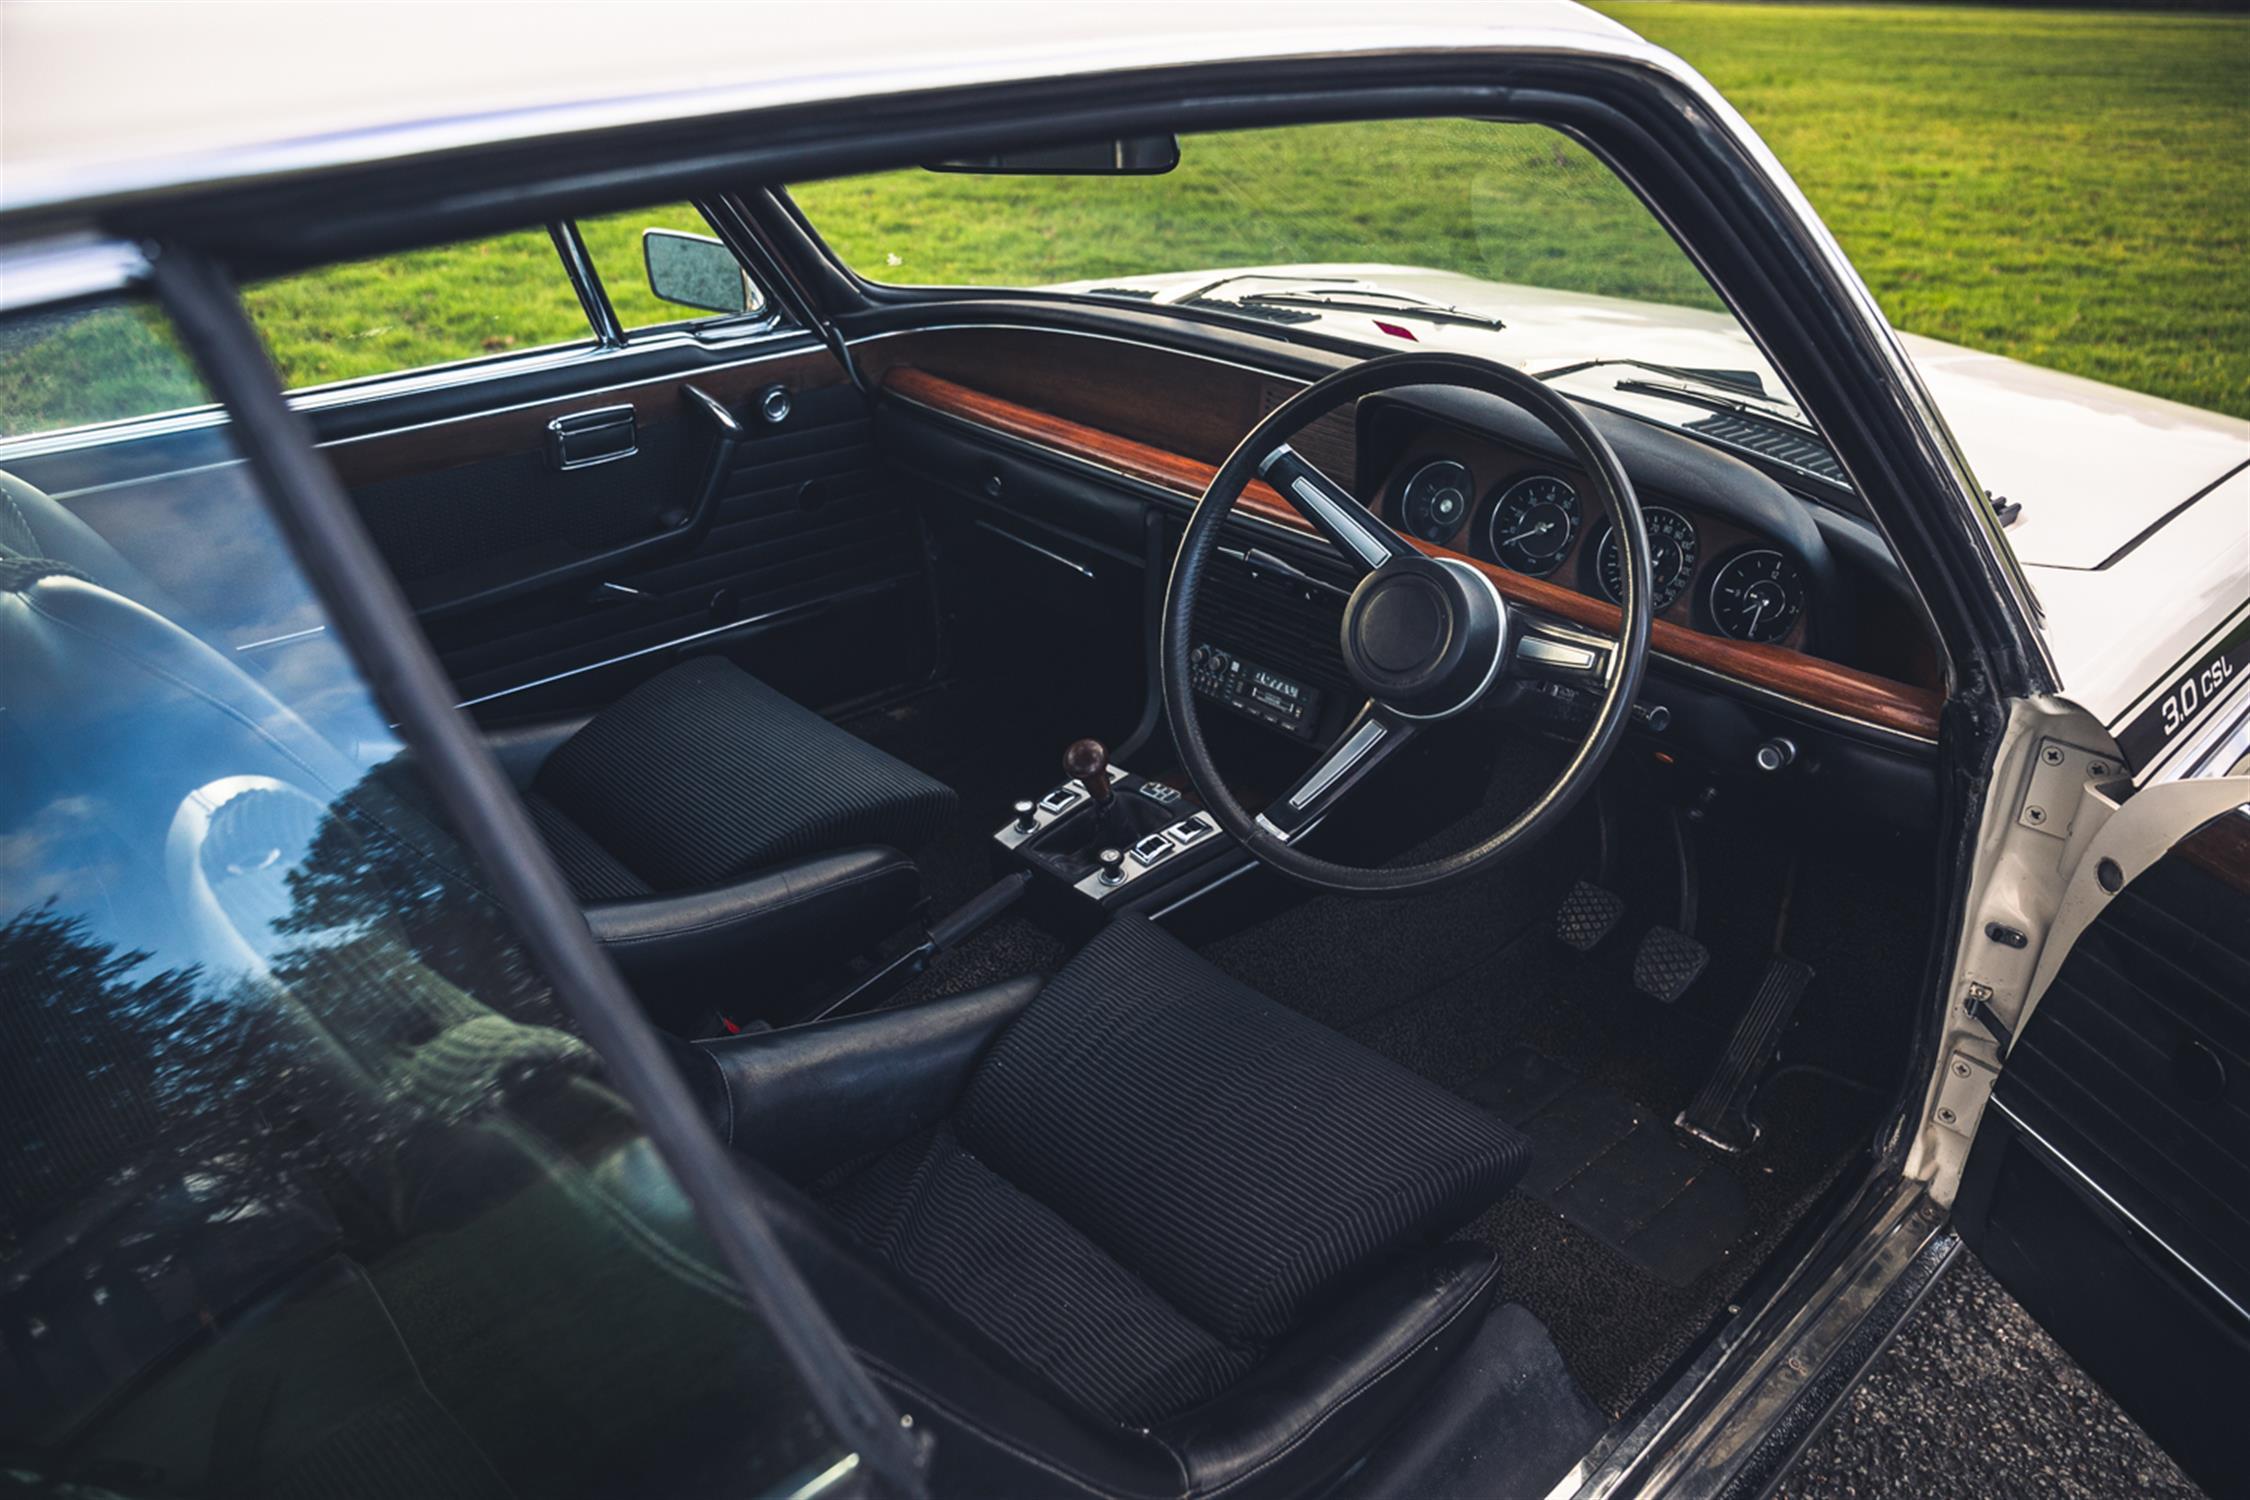 1973 BMW 3.0 CSL - Image 2 of 10